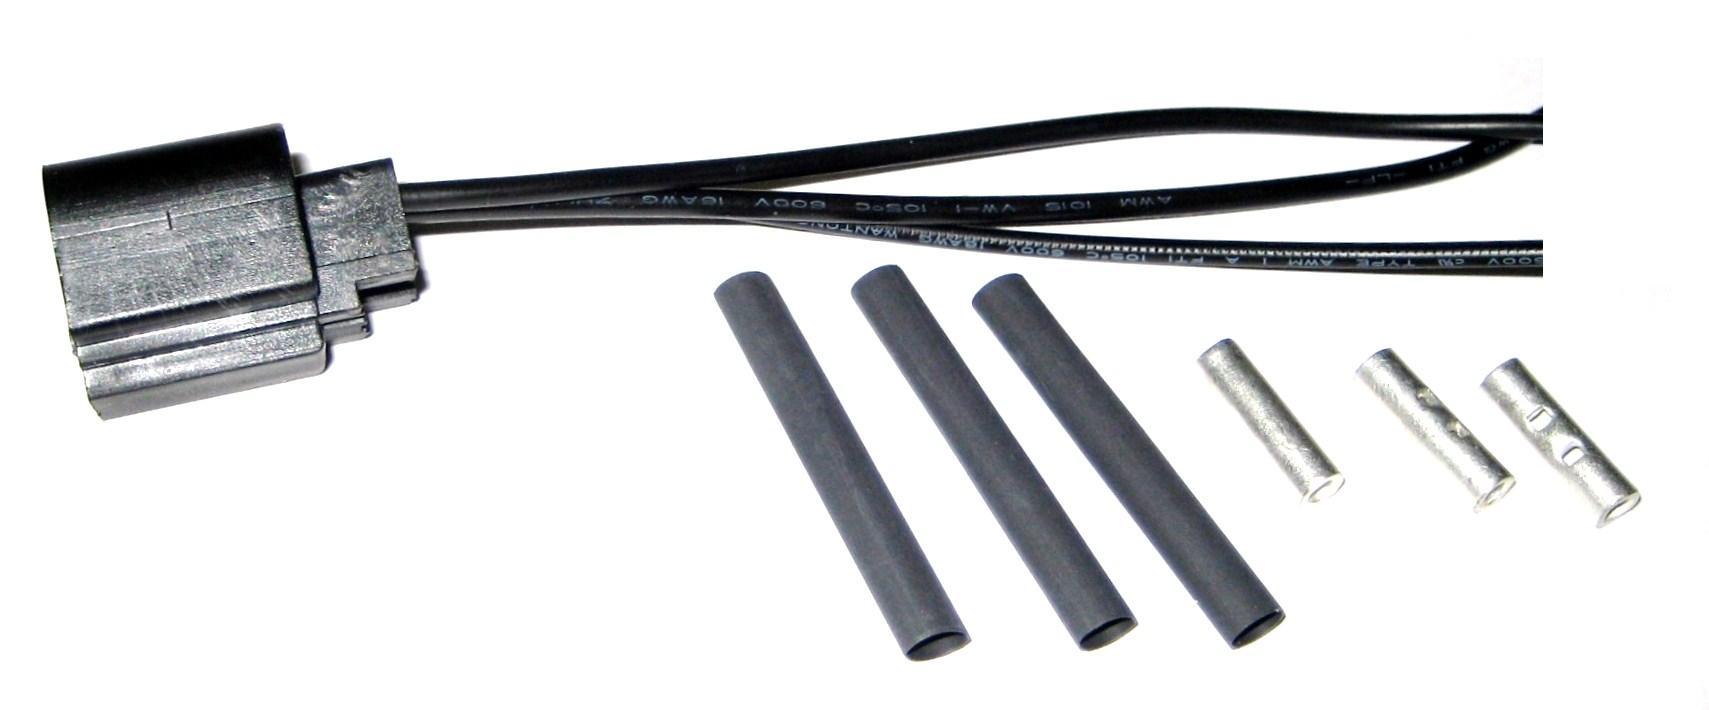 mustang headlight wiring harness repair kit 2005 2011. Black Bedroom Furniture Sets. Home Design Ideas